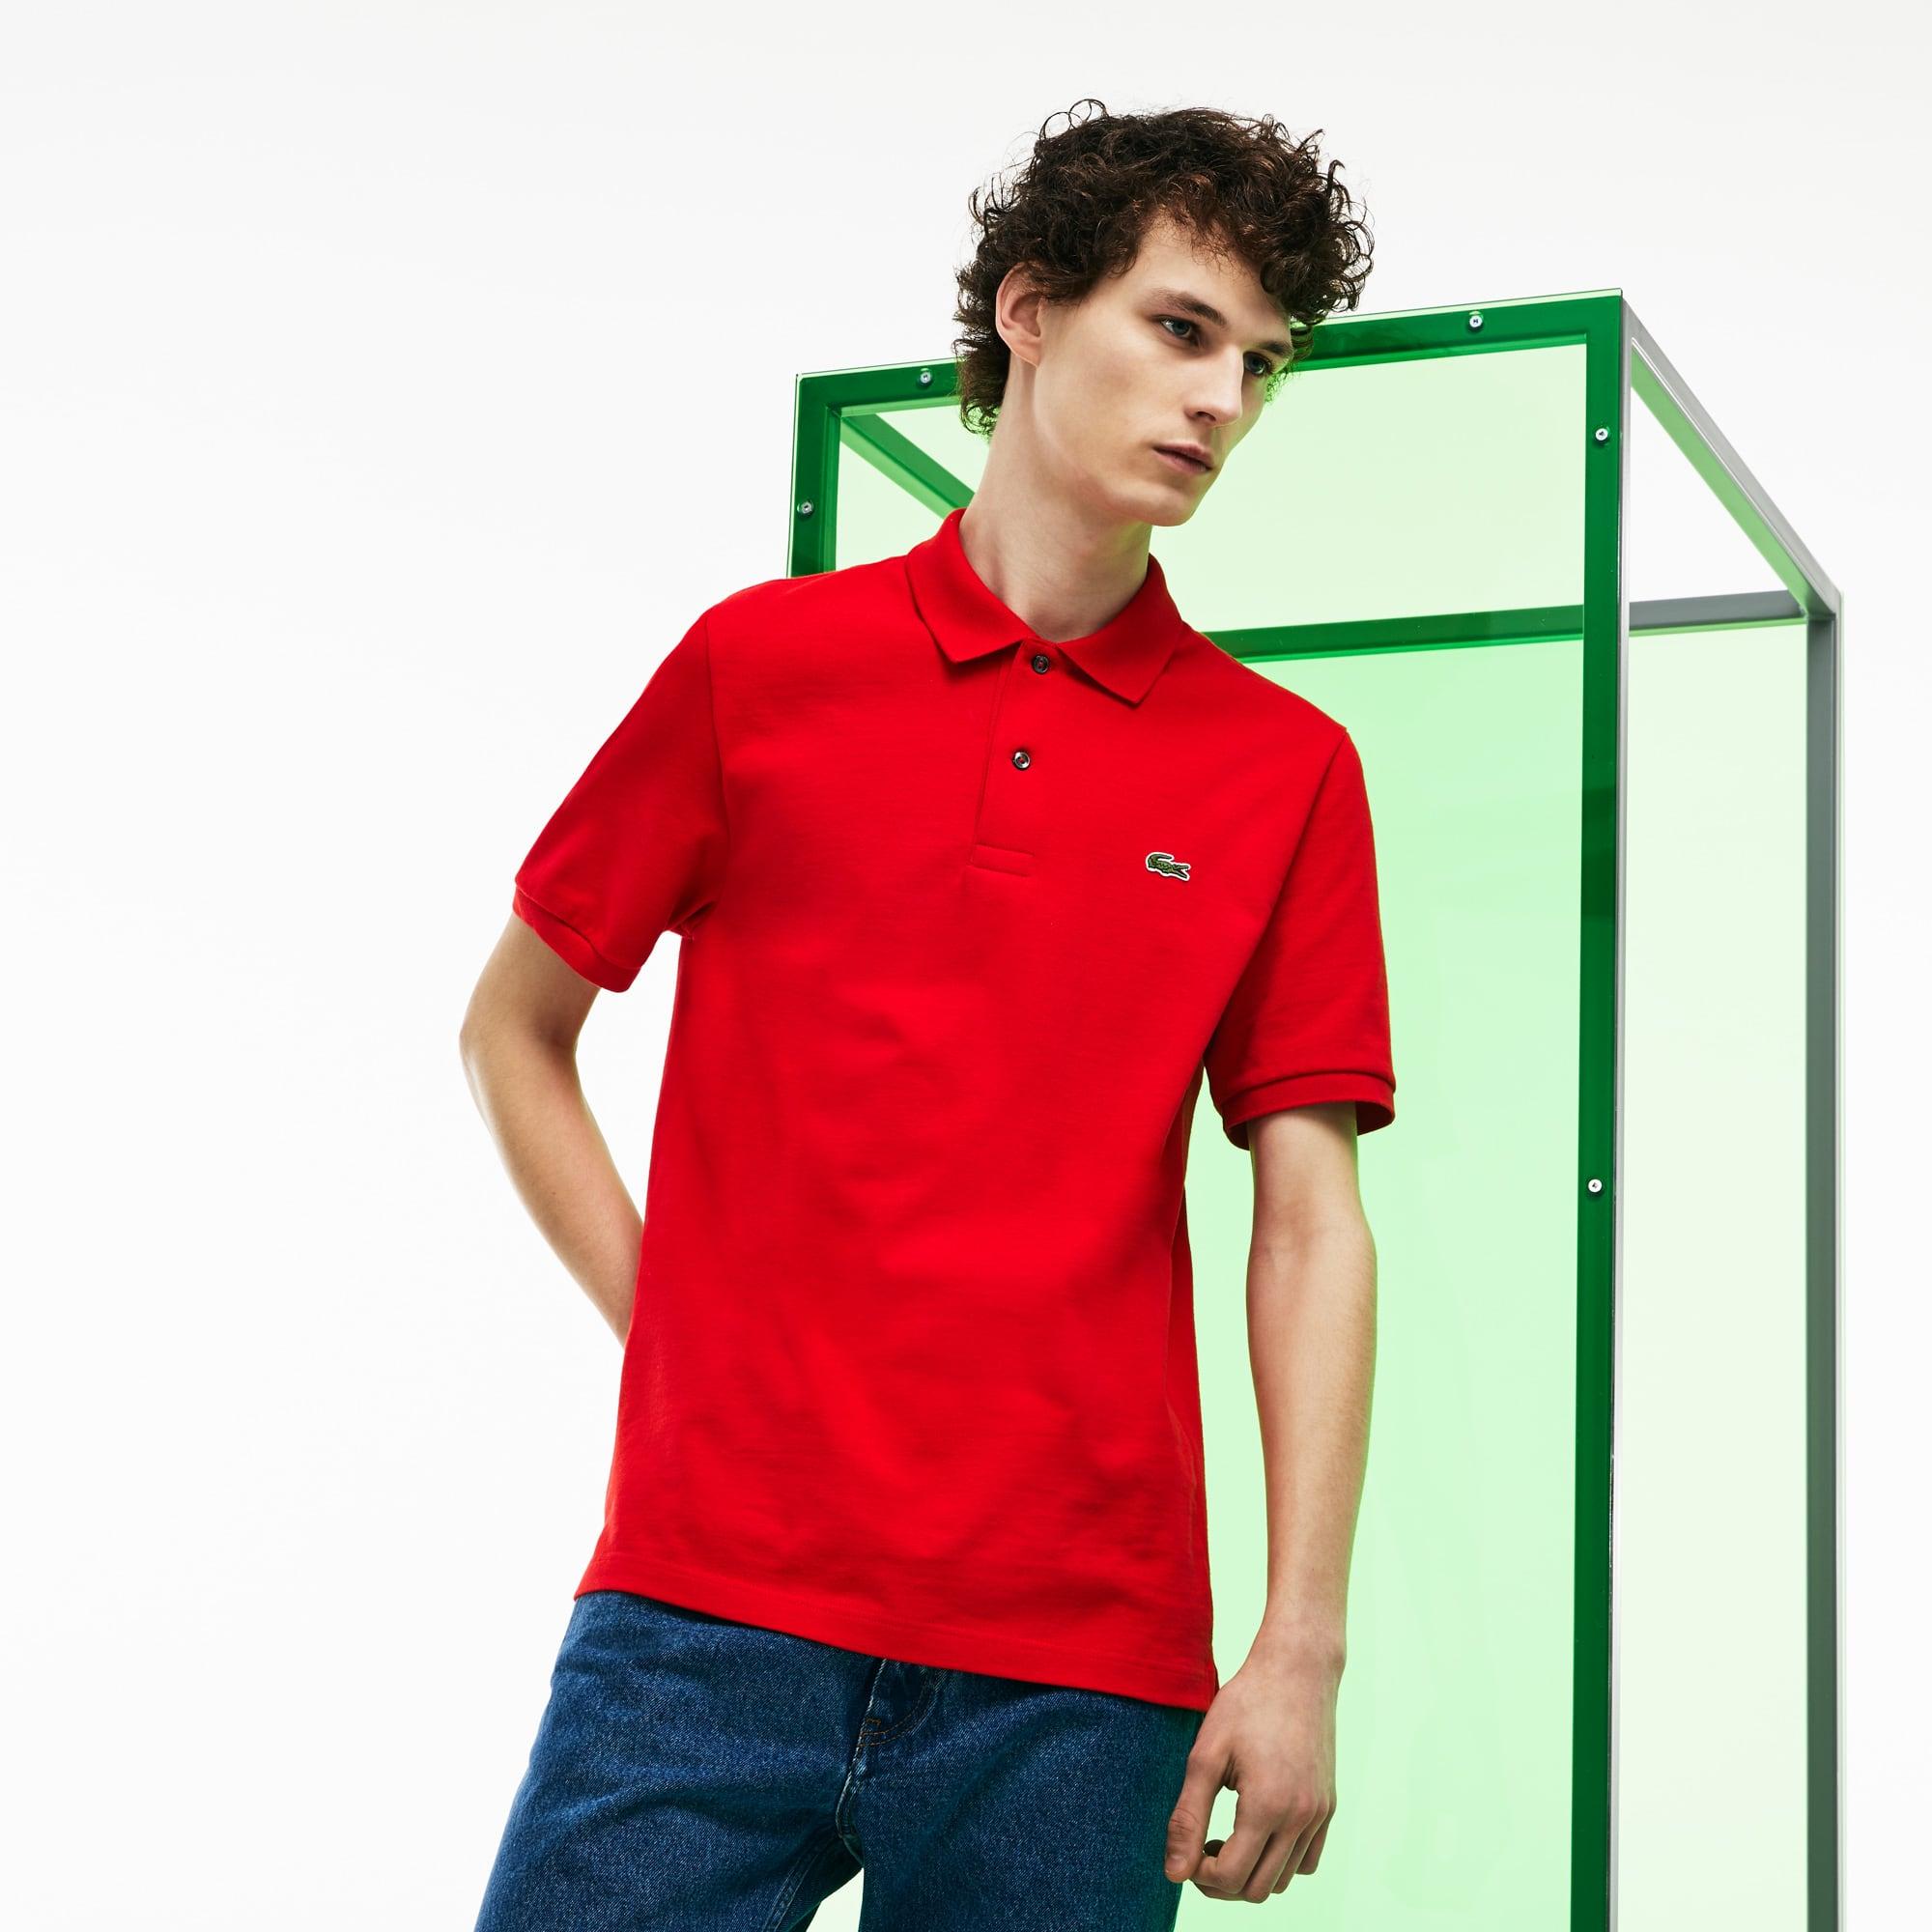 Men's Lacoste Fashion Show Thick Cotton Jersey Polo Shirt